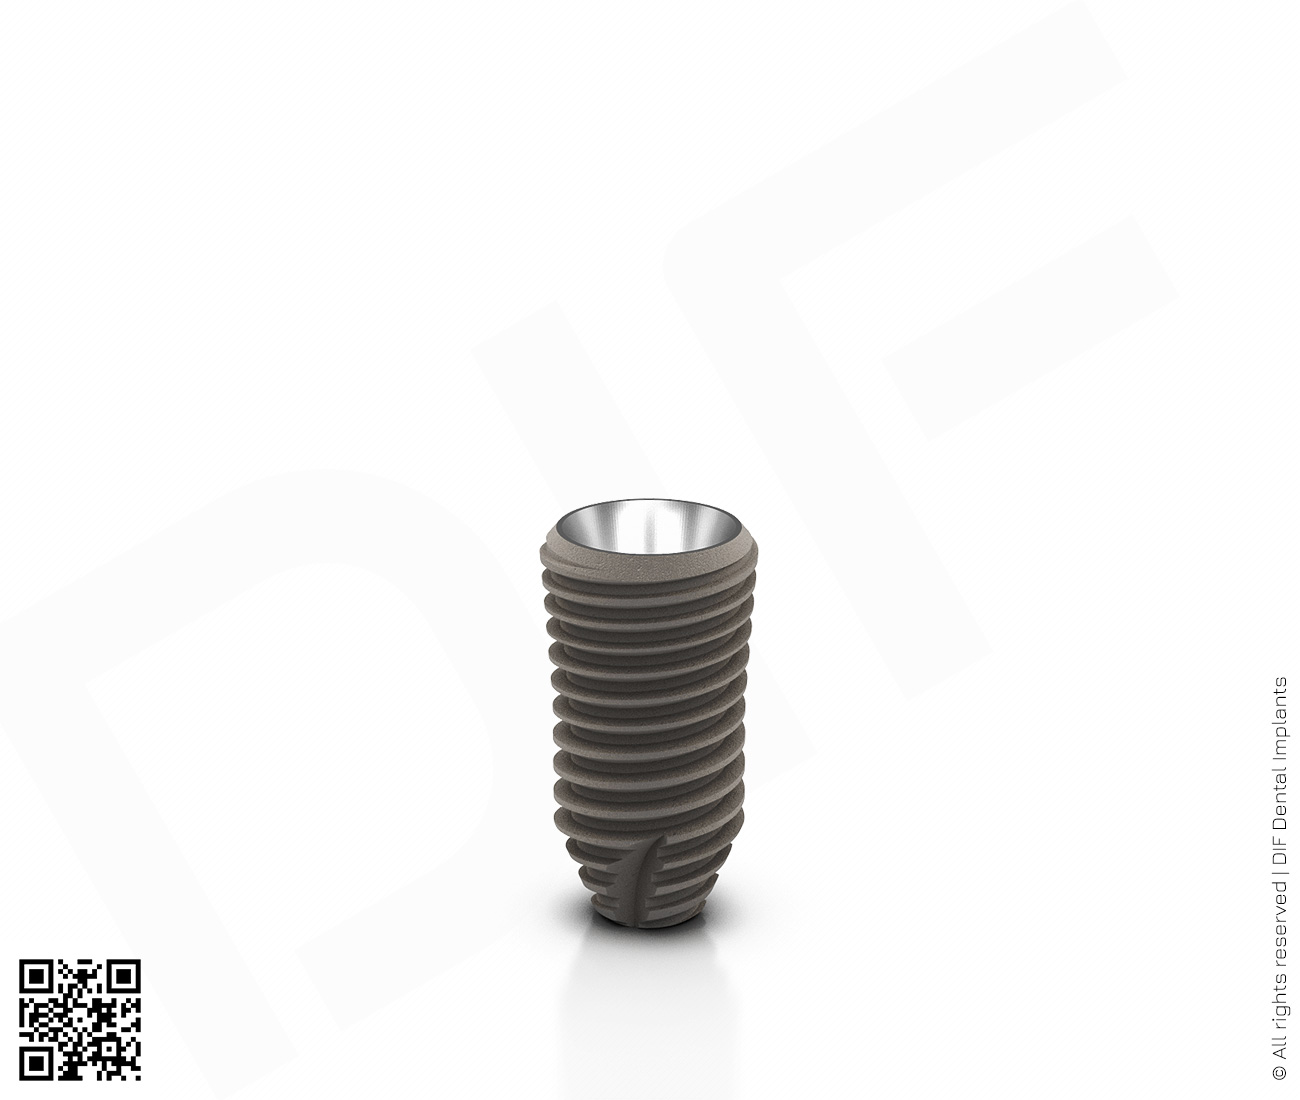 Фото имплантат mainstream fine d4.2 мм – l8.0 мм  производства DIF.